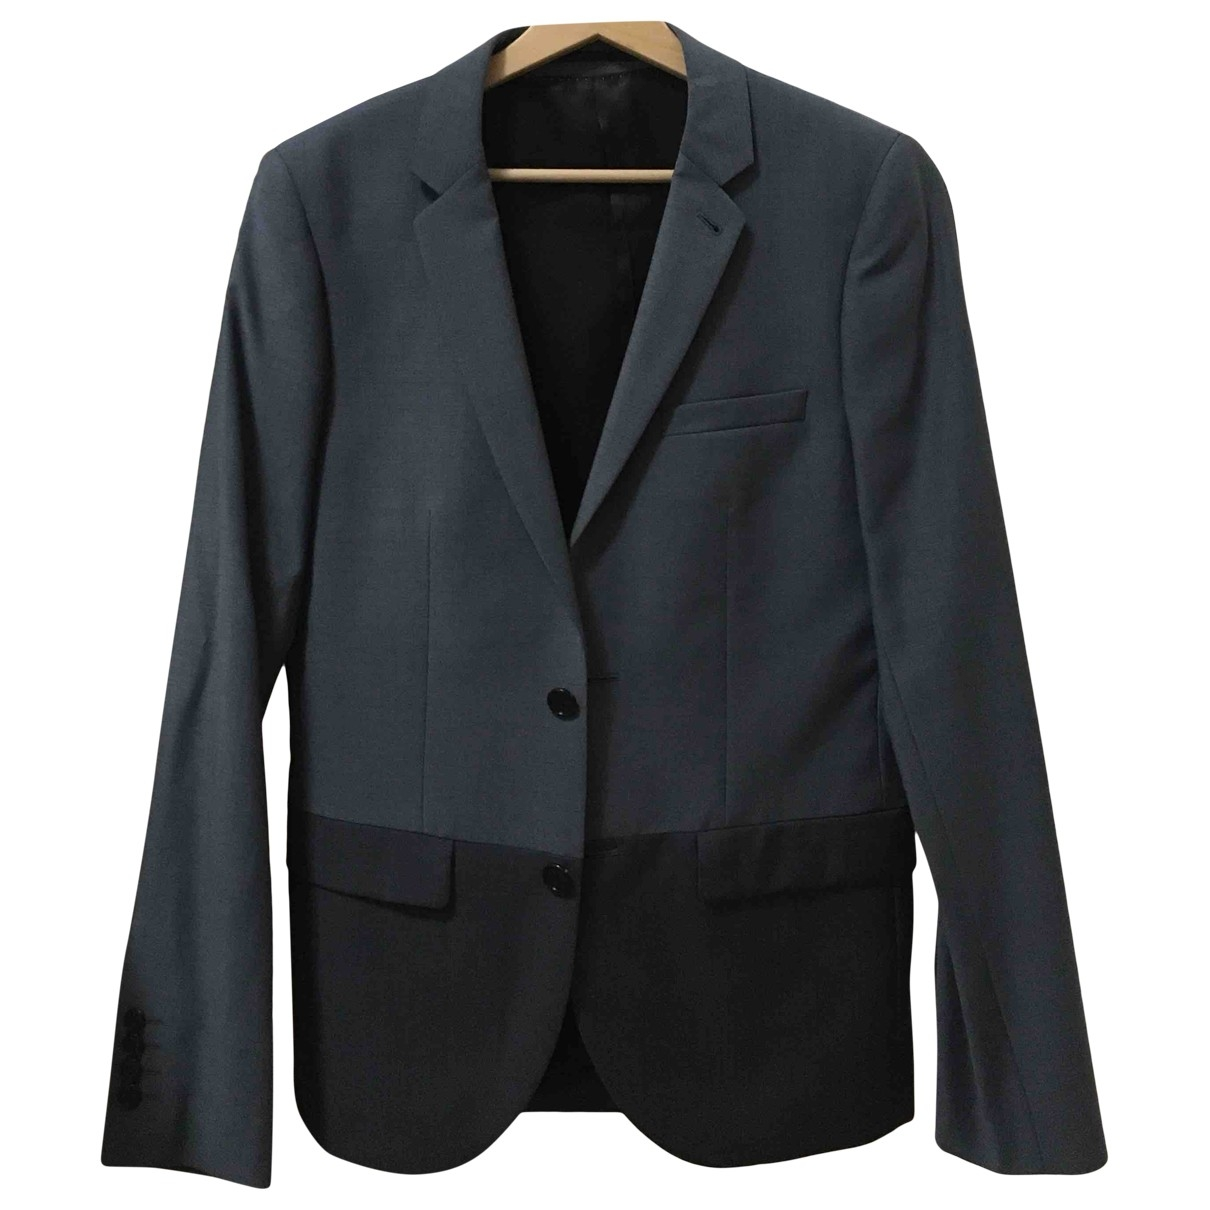 Topman \N Jacke in  Blau Wolle